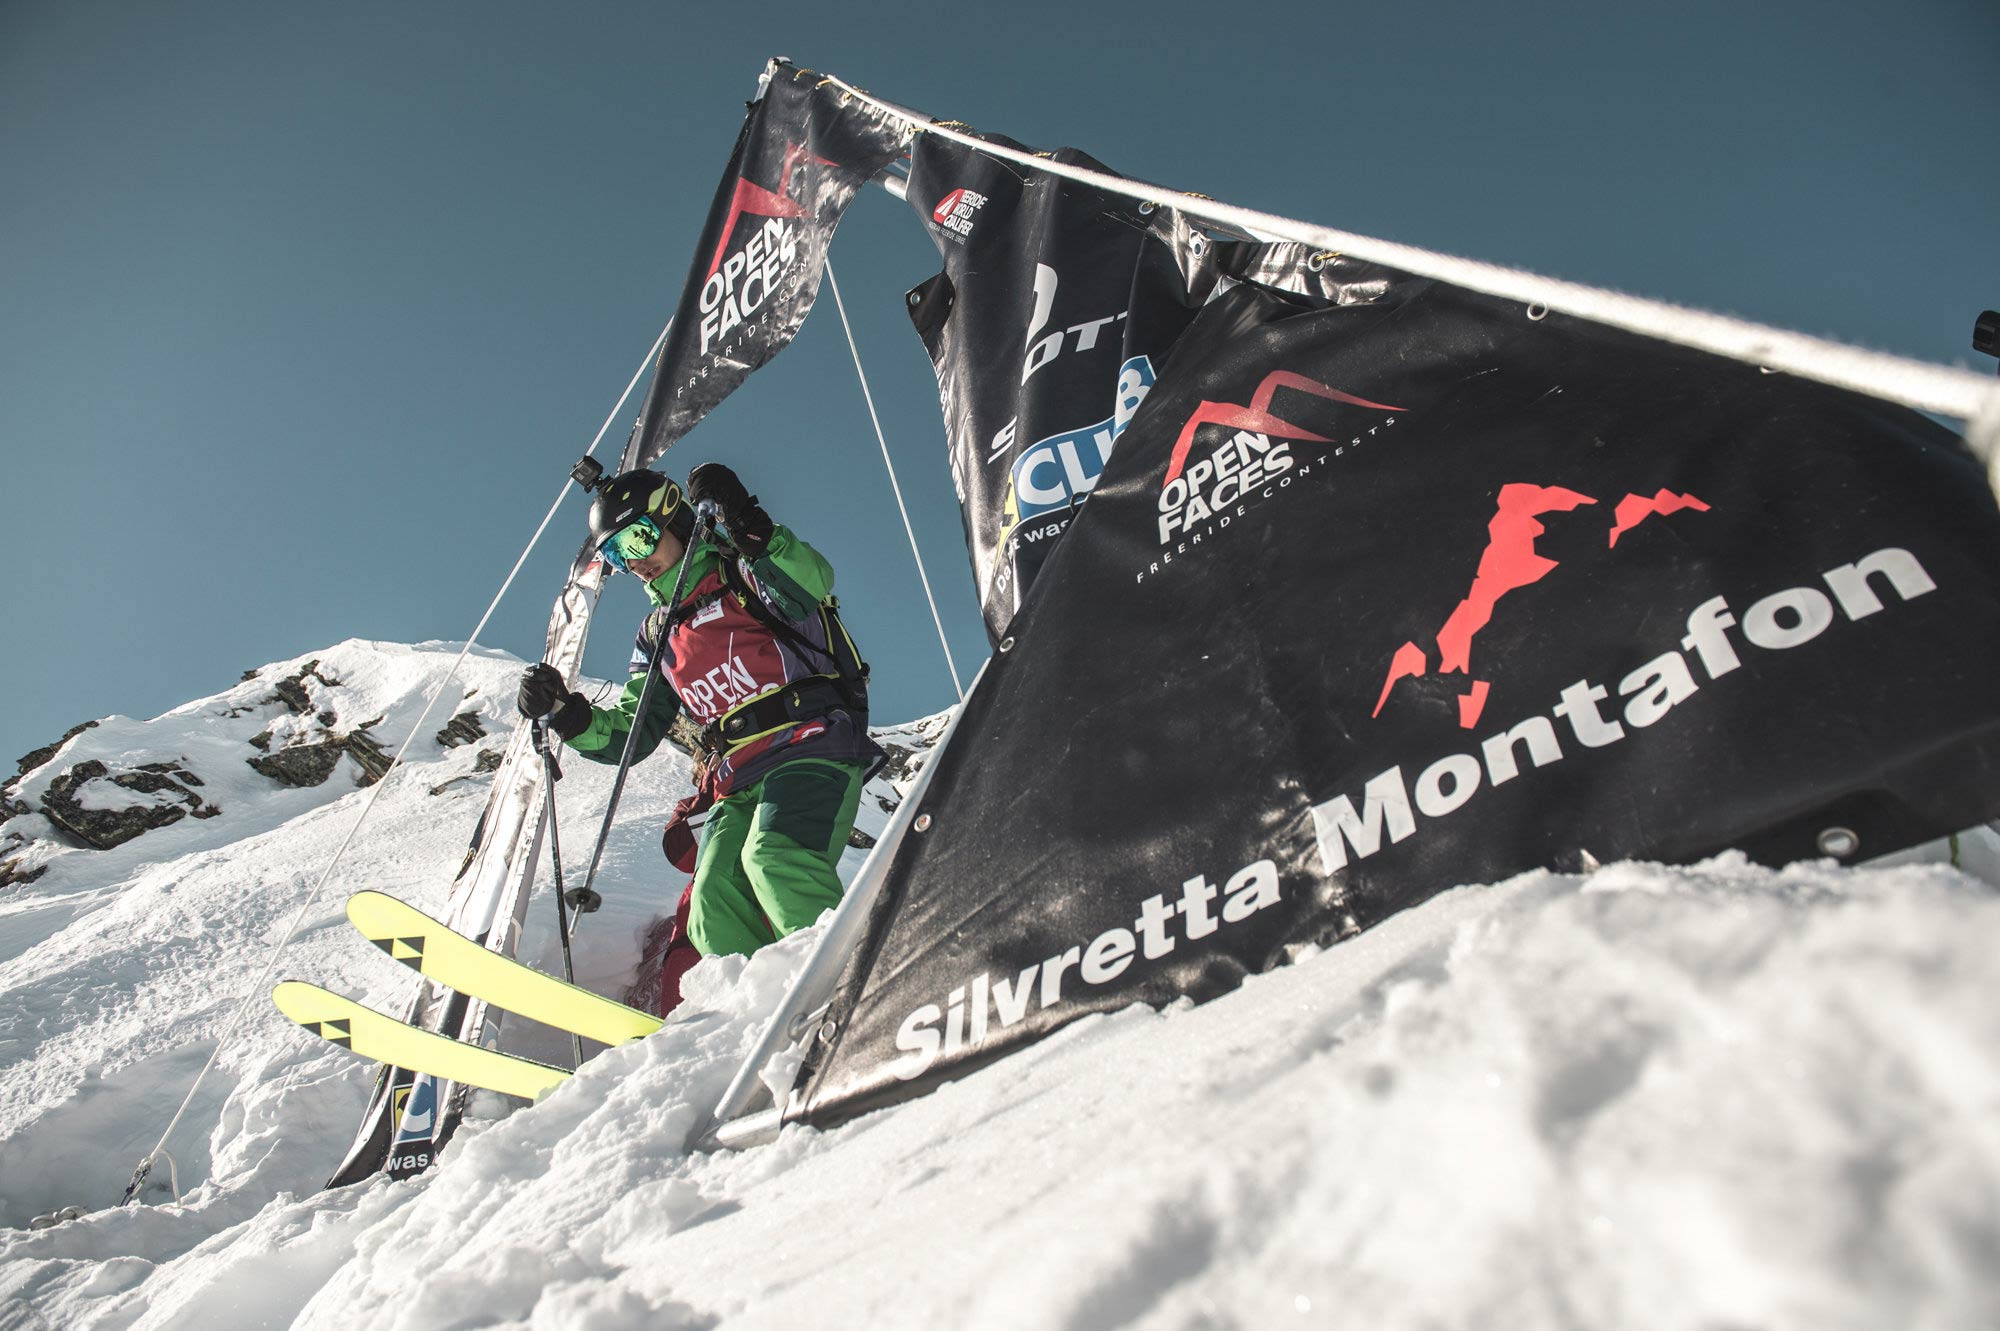 Schnappte sich in Silvretta-Montafon seinen ersten 3*FWQ Sieg: Markus Breitfuß - Foto: Open Faces / Andreas Vigl